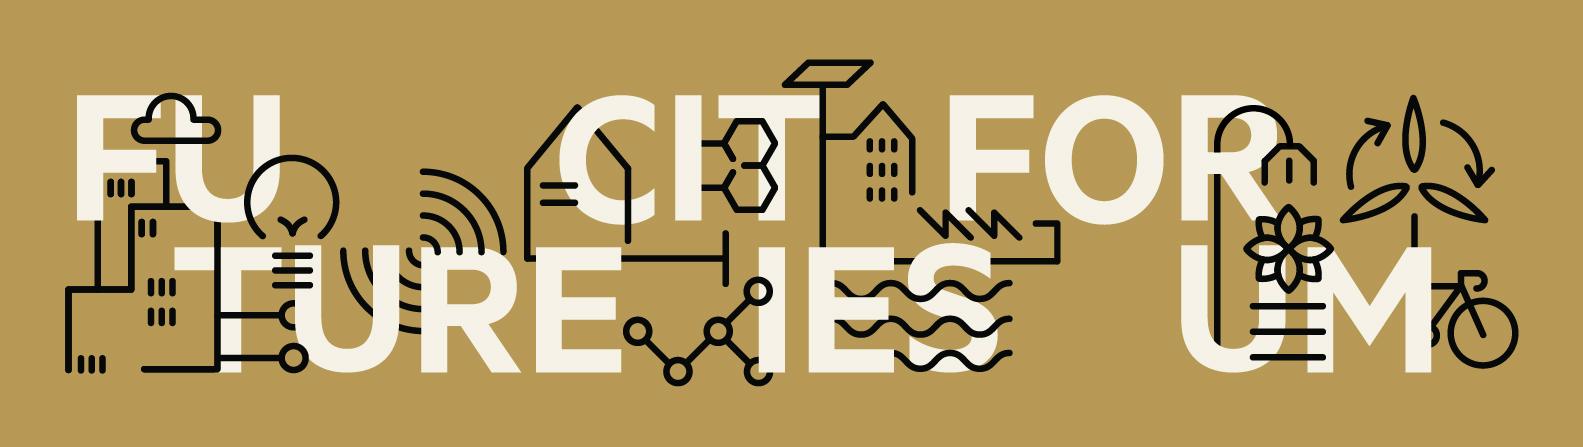 FUTURE CITIES FORUM: ArtEngine & Impact Hub Ottawa host conference considering #digital impact on #citybuilding